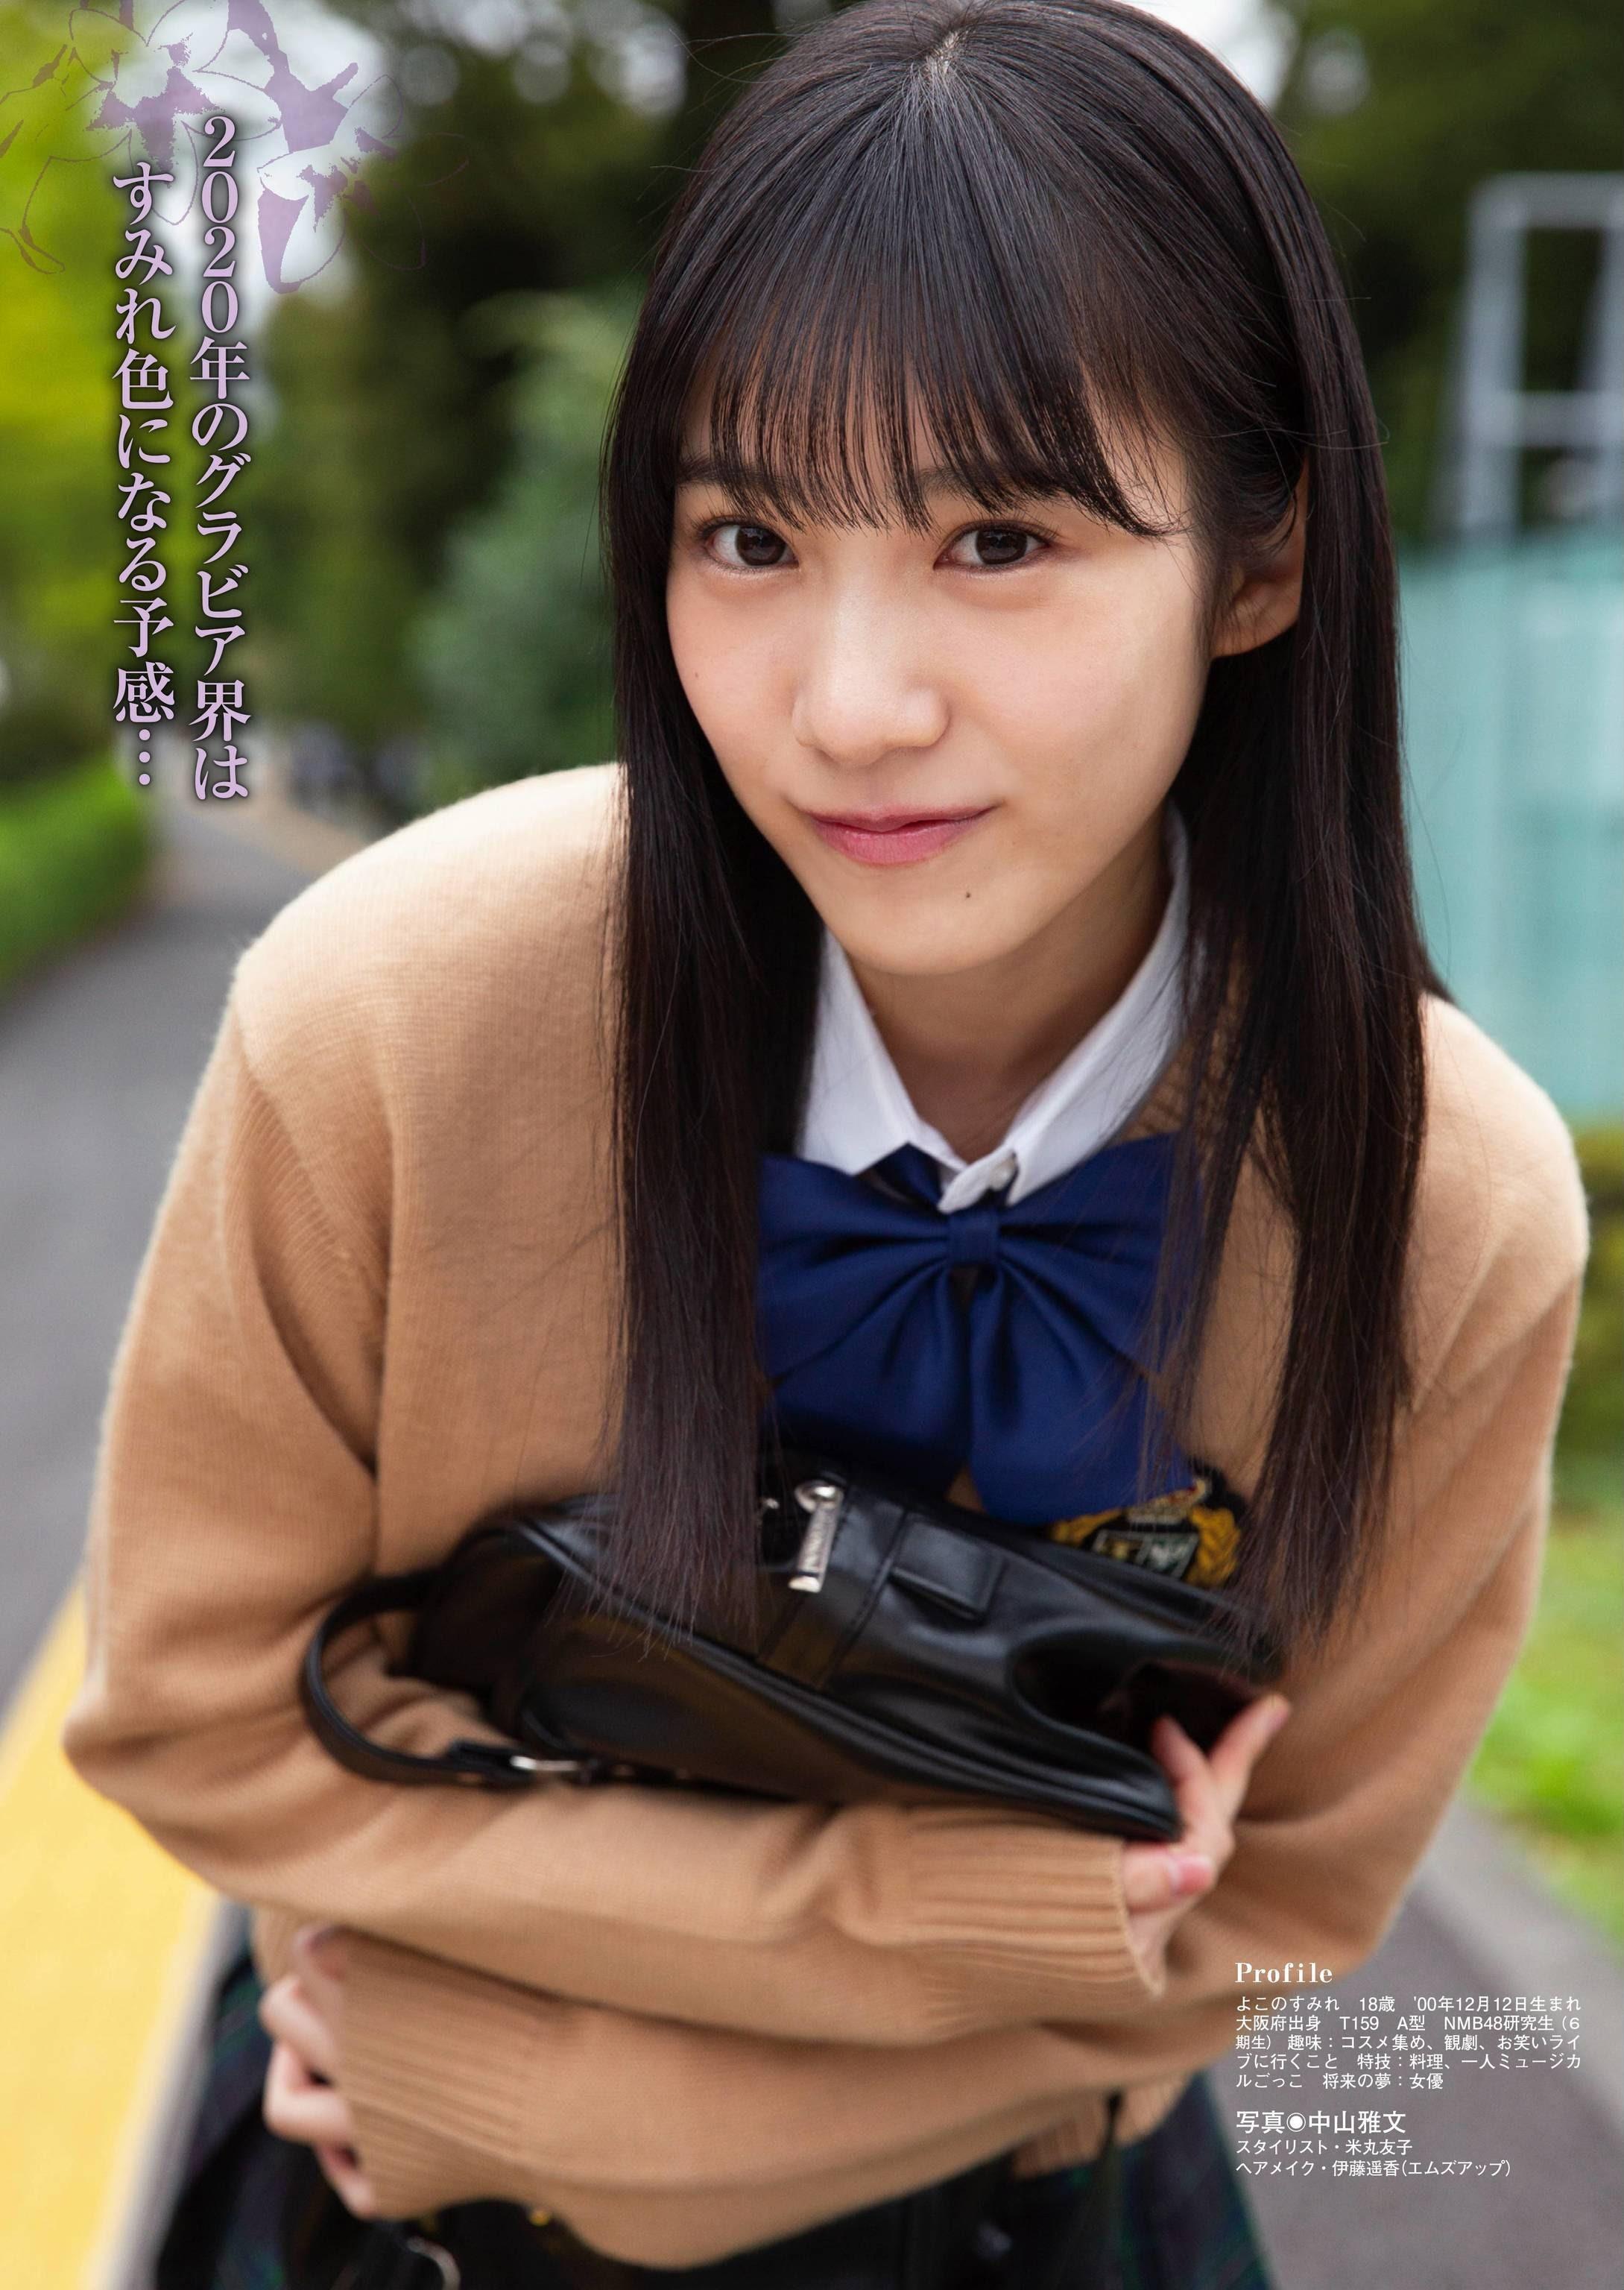 06-Sumire Yokono (7)